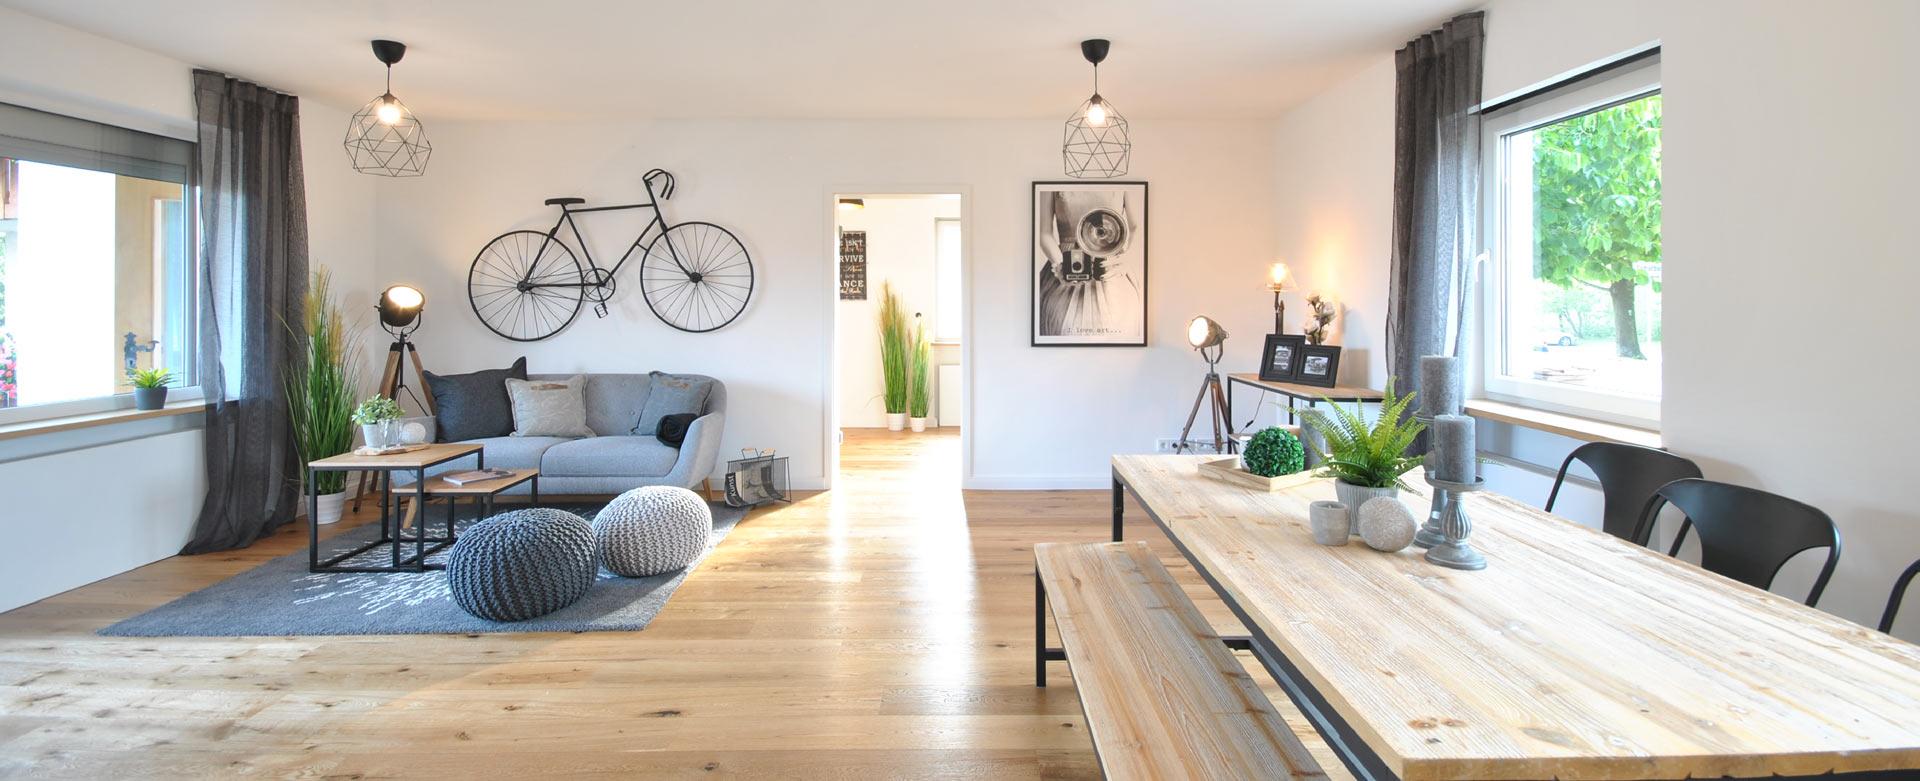 Immobilien besser präsentieren